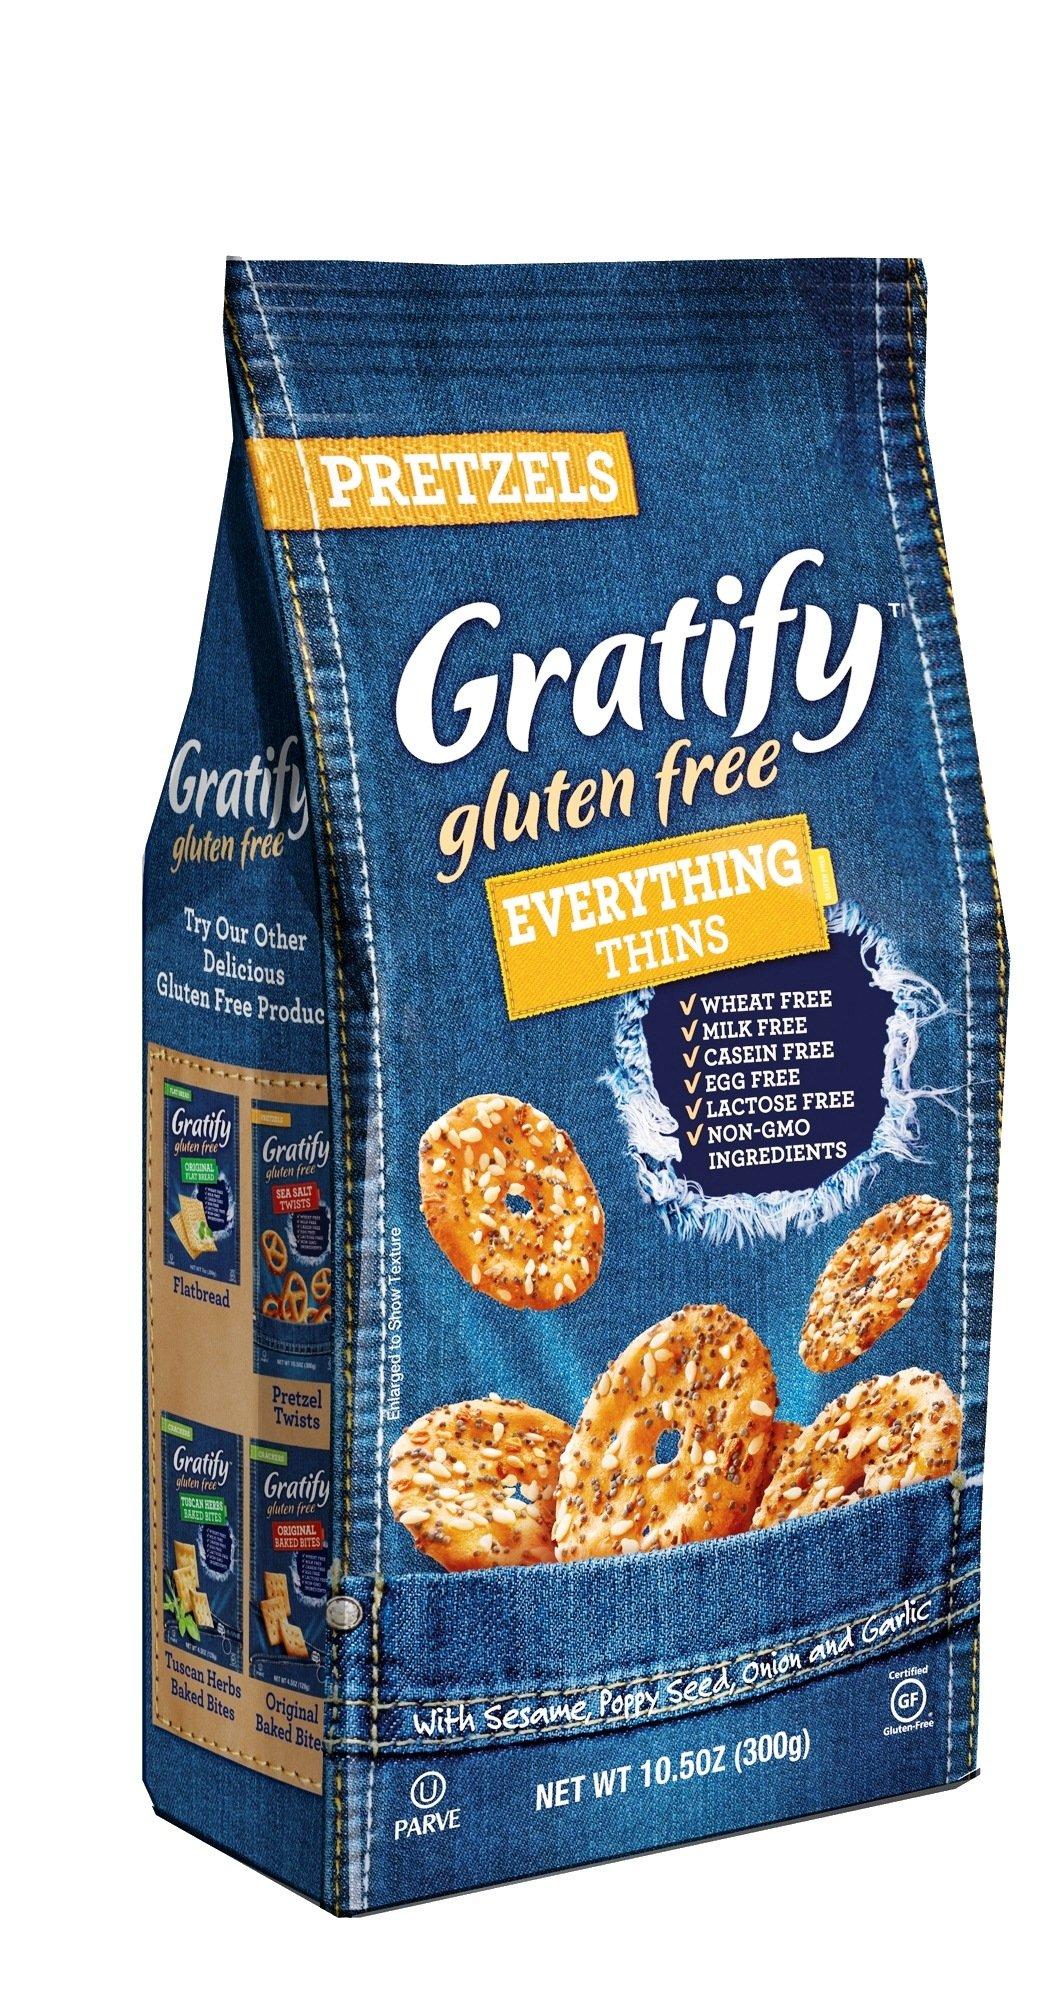 Gratify Gluten Free Pretzel Thins Everything Vegan GF Pretzel Crisps, 10.5oz Bag (Pack of 6) by Gratify